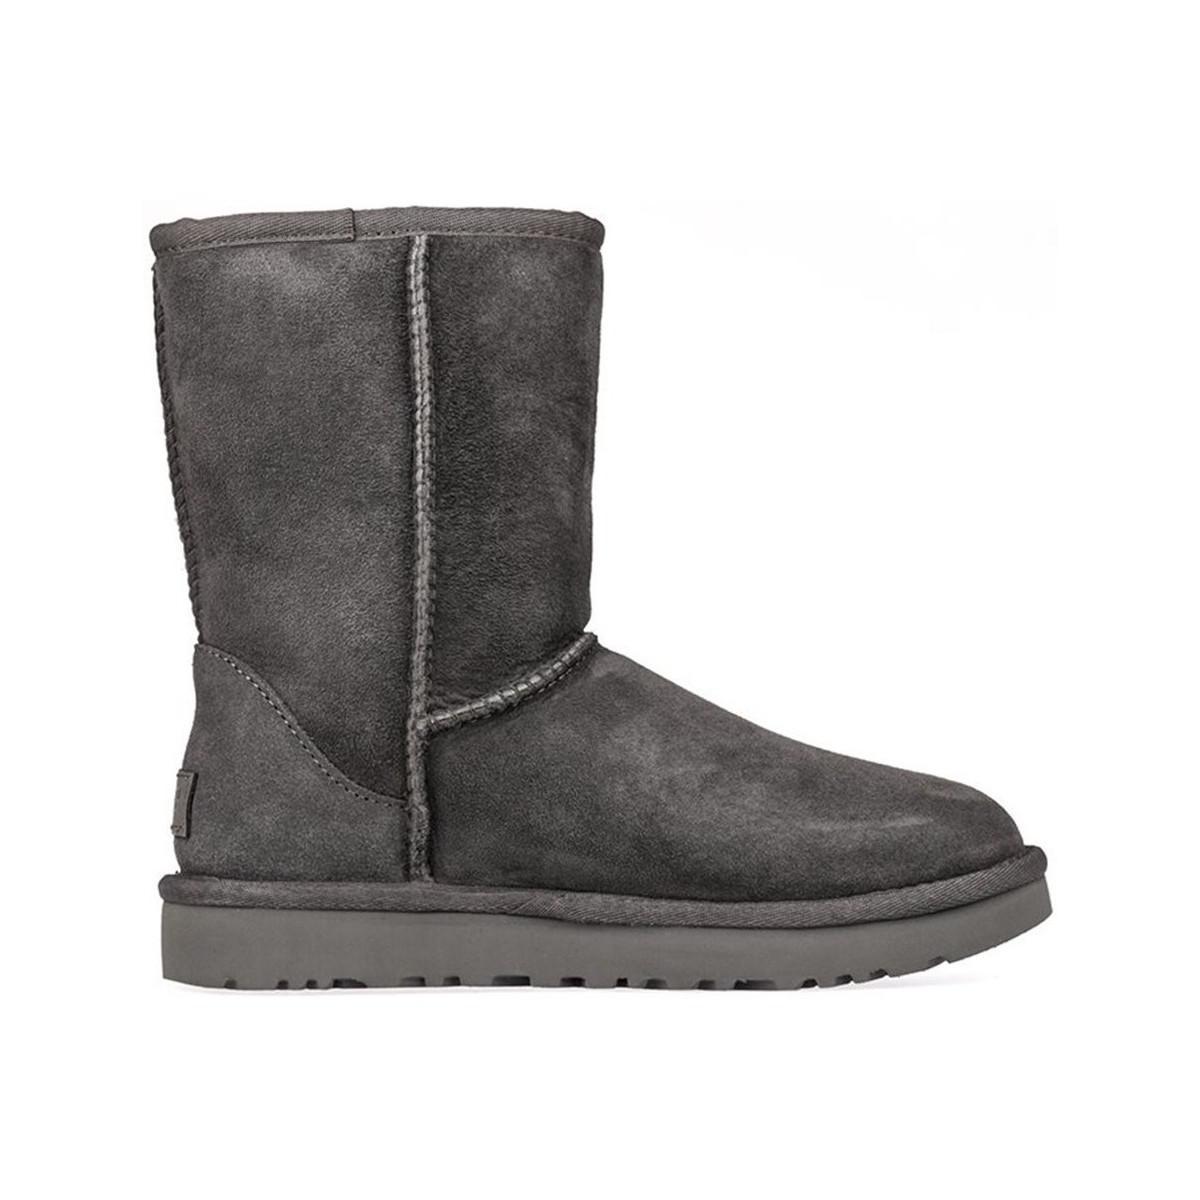 83fc89fec05a Ugg Classic Grey Short Mid Gray Ii Women s Boots Lyst In a7TqawWrF